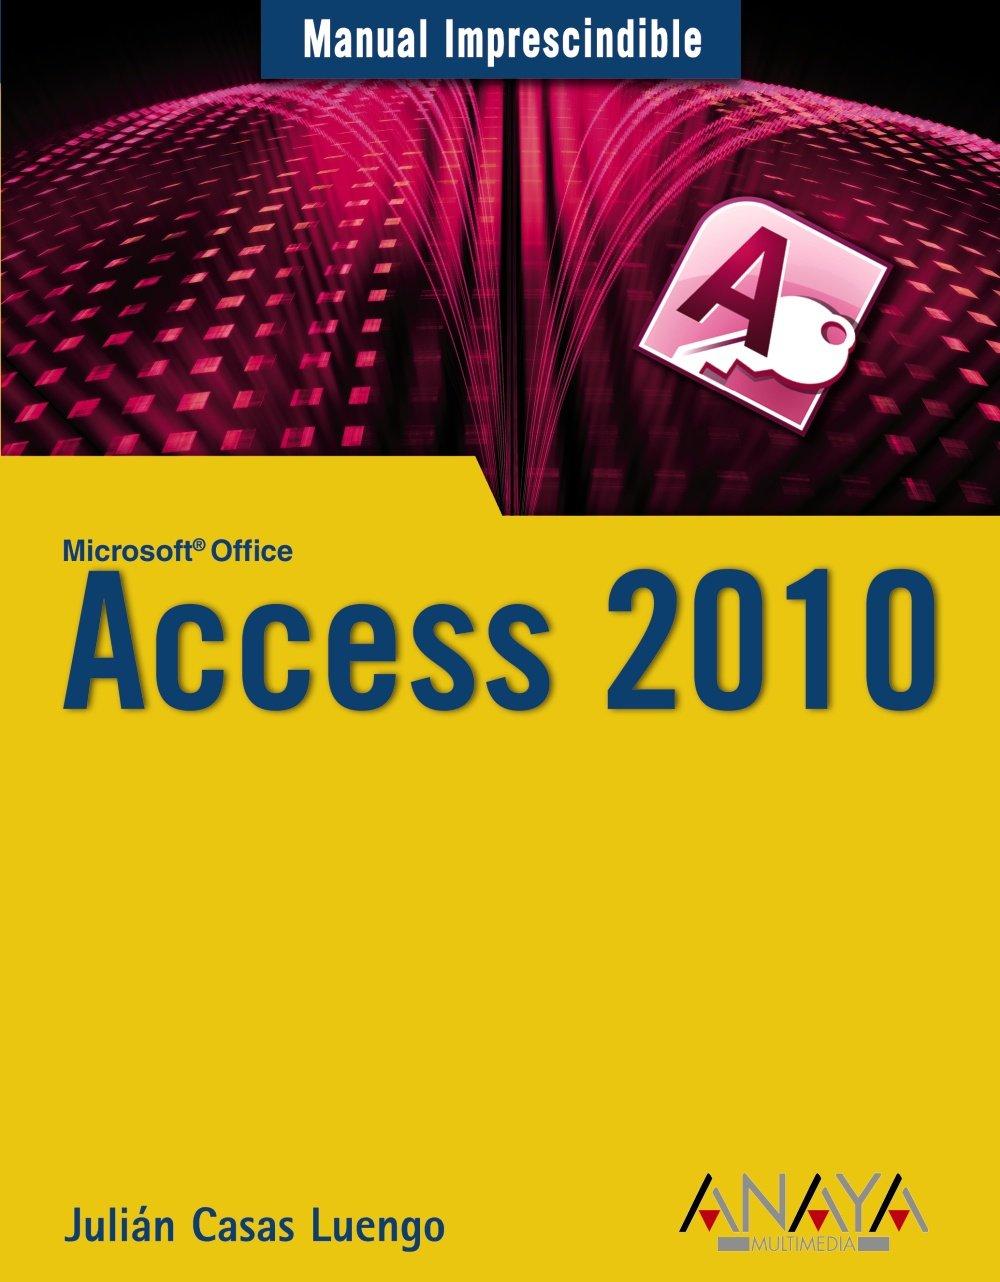 Access 2010 (Manuales Imprescindibles) Tapa blanda – 27 sep 2010 Julián Casas ANAYA MULTIMEDIA 8441527814 General